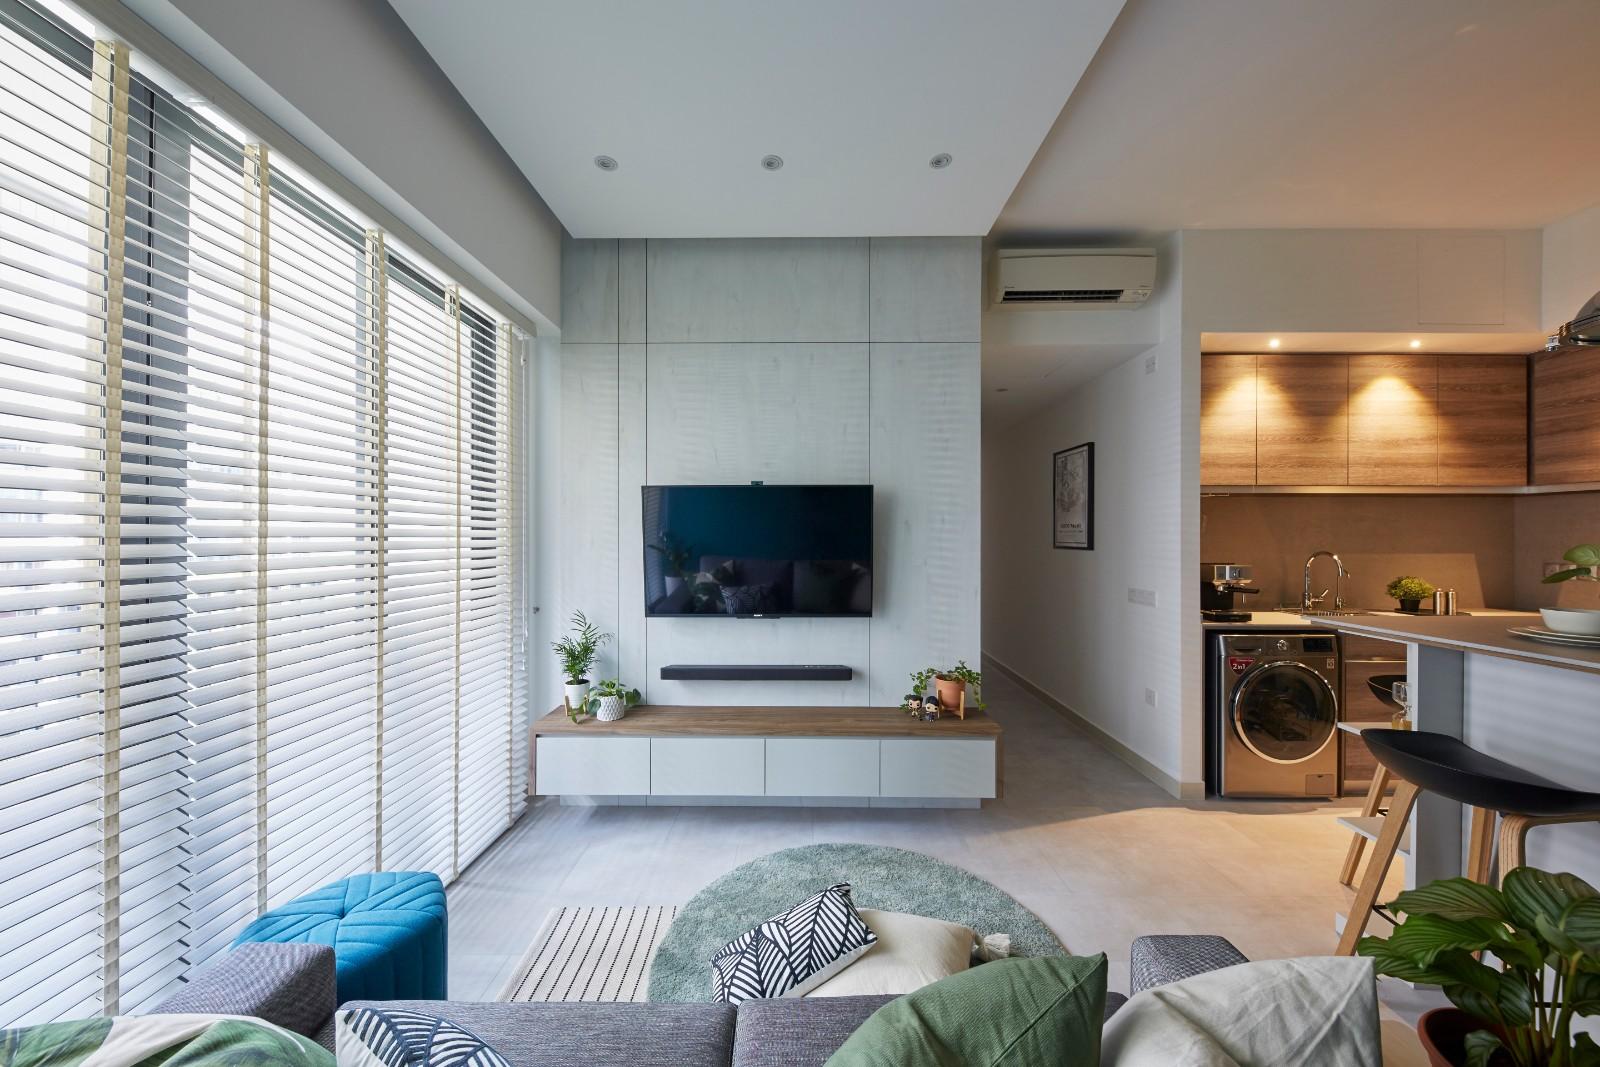 Carpenters top interior design company condo contemporary